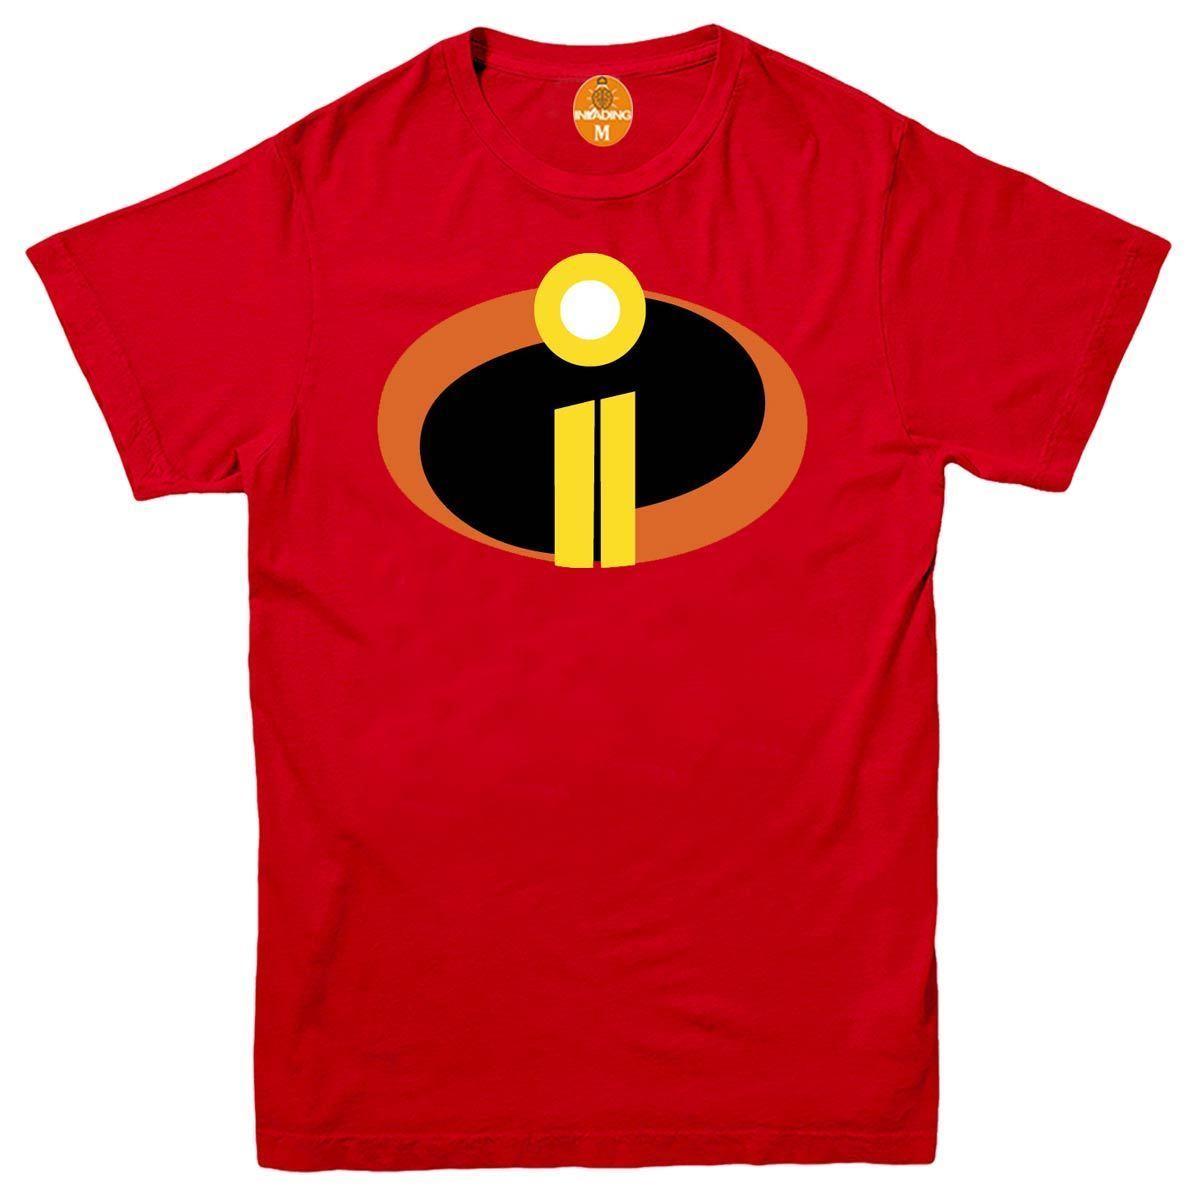 18 Children Adults The Incredibles 2 Superhero Tee Shirt Disney World World Pixar Humorous Joke